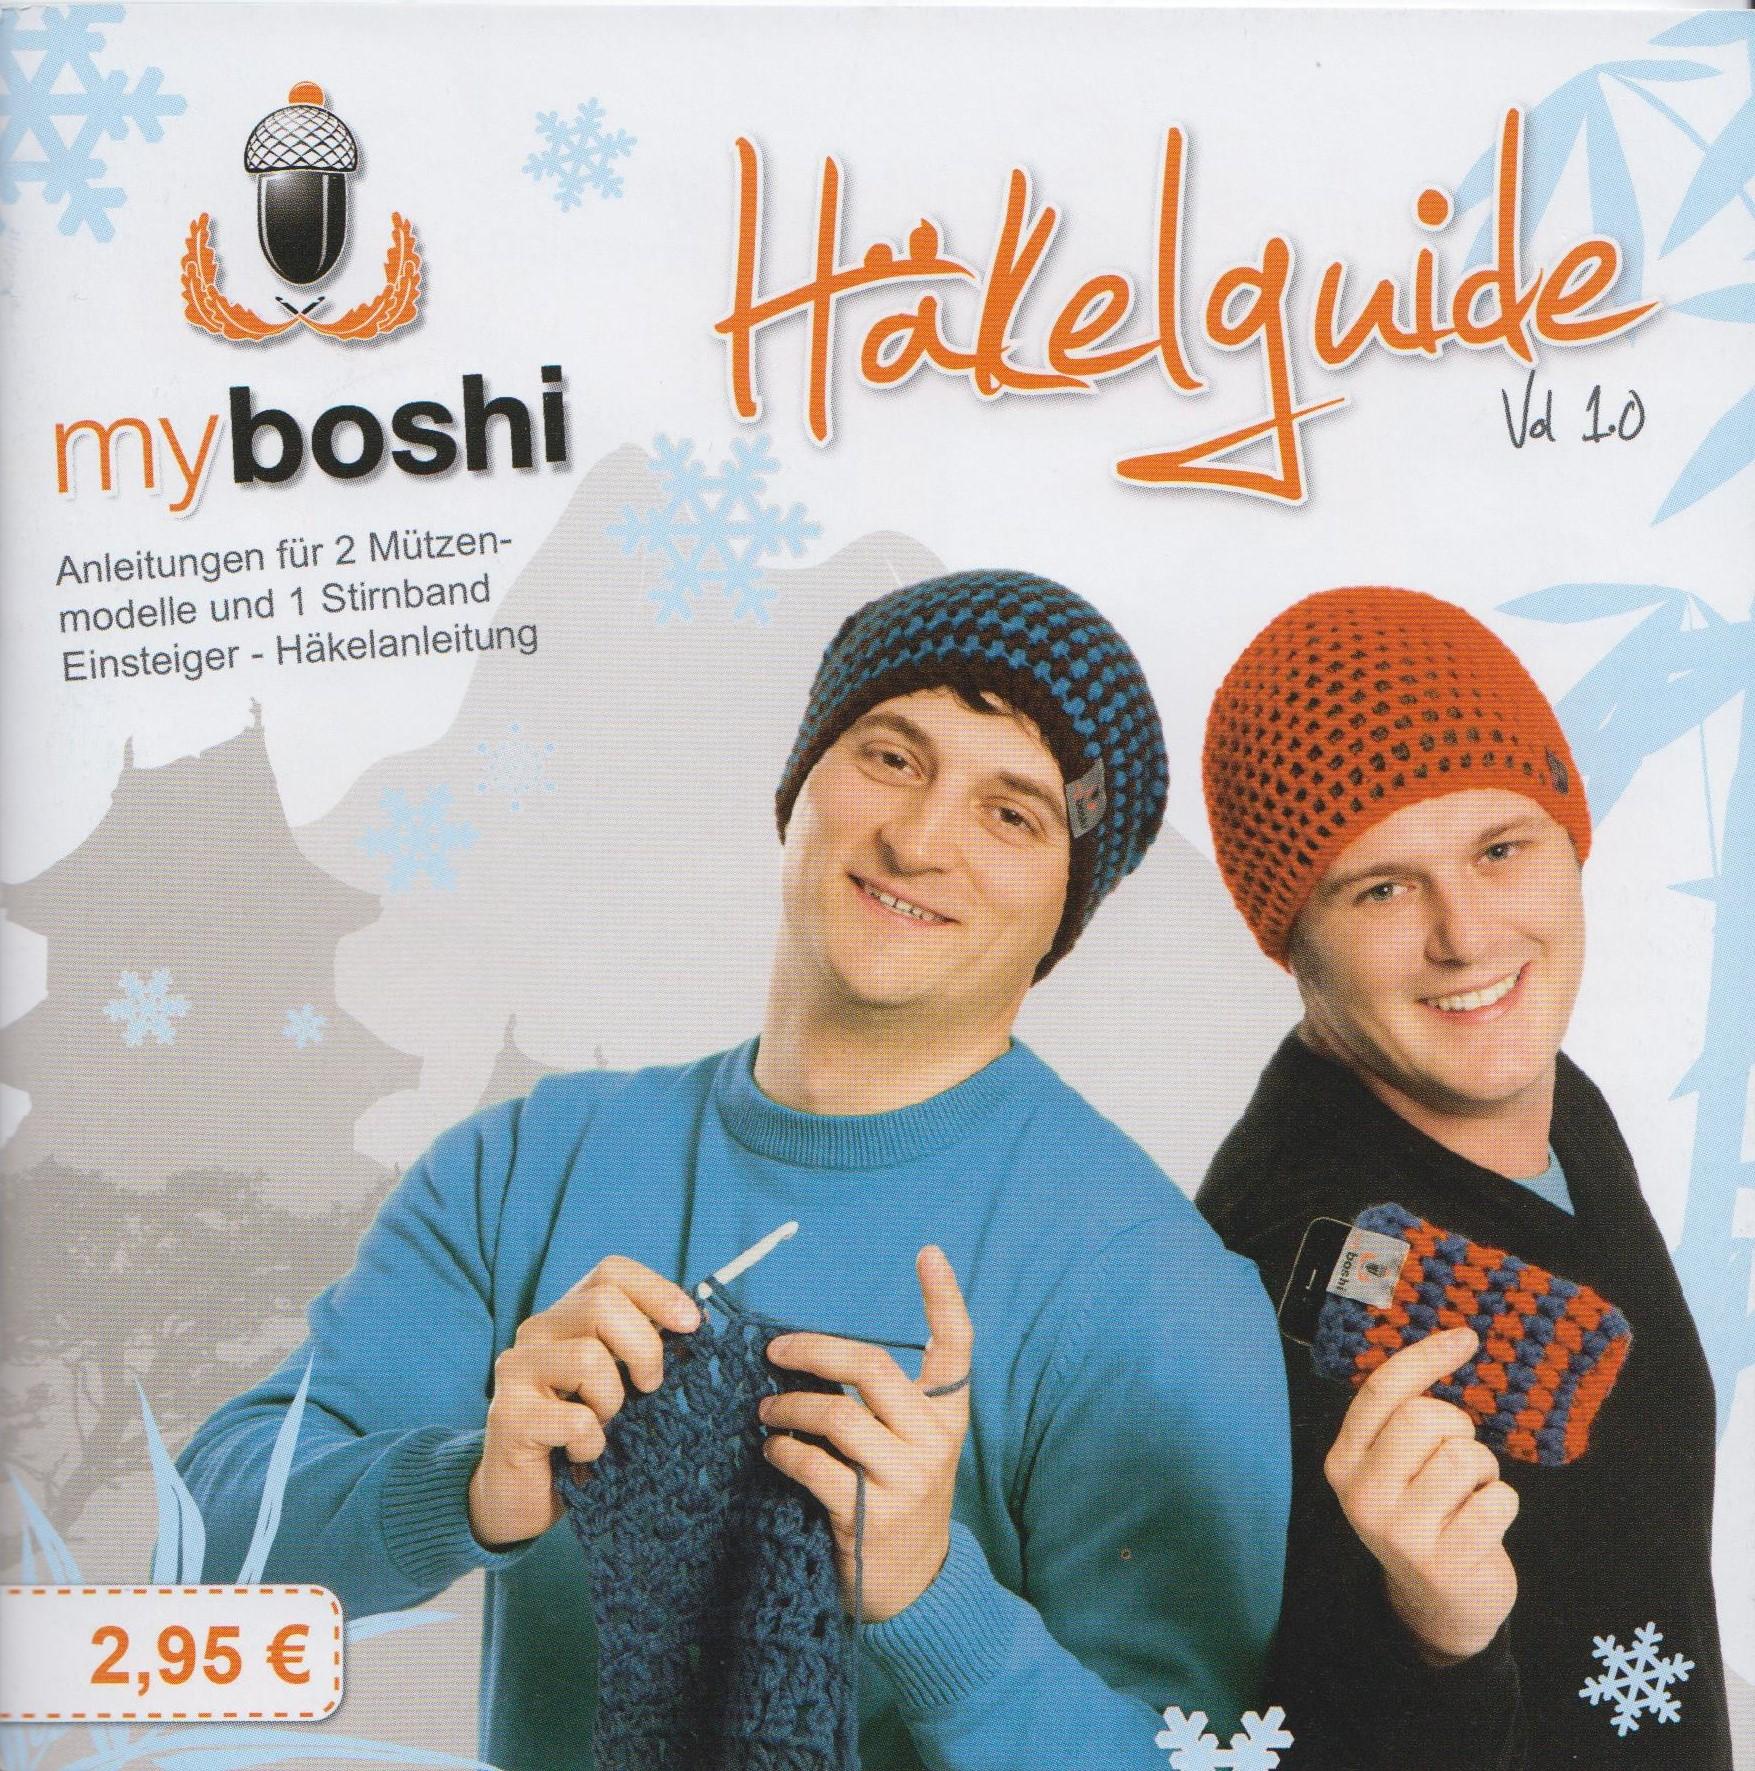 Die Wollstube Myboshi Häkelguide Vol10 Handarbeitsartikel